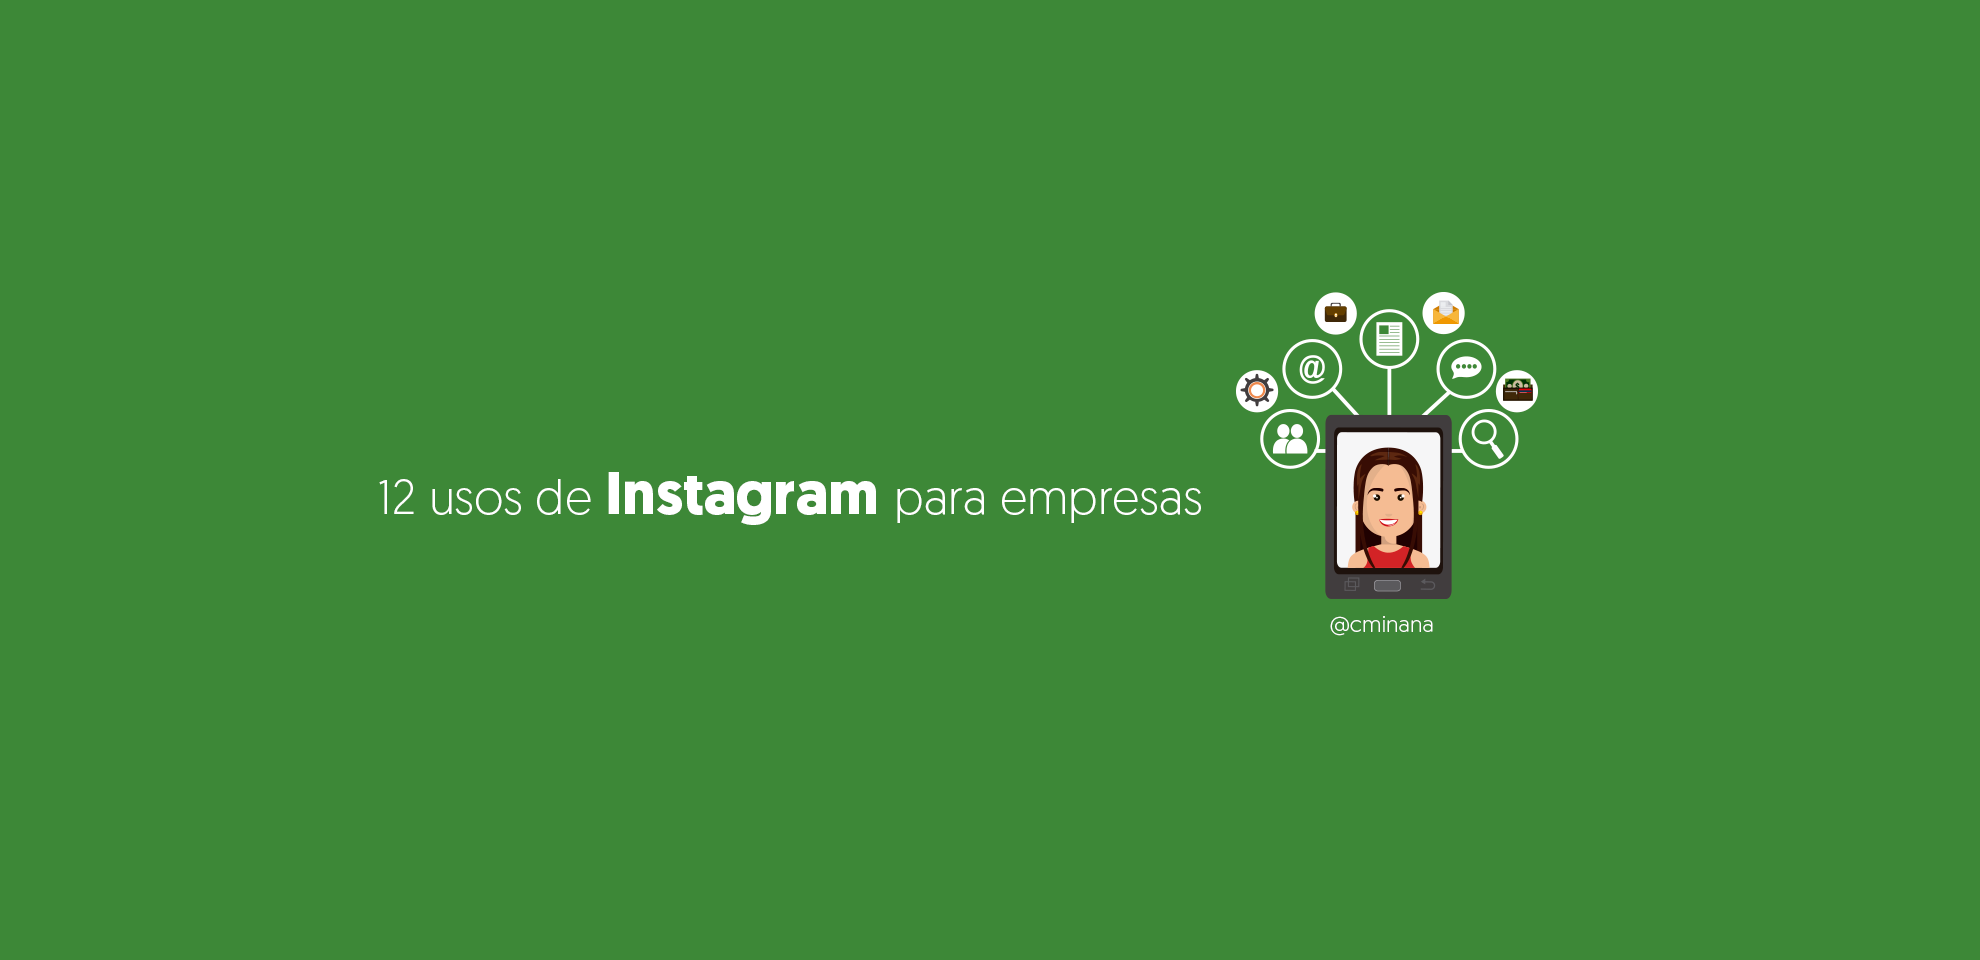 http://cdn2.publicidadenlanube.es/wp-content/uploads/2016/09/instagram-para-empresas.png